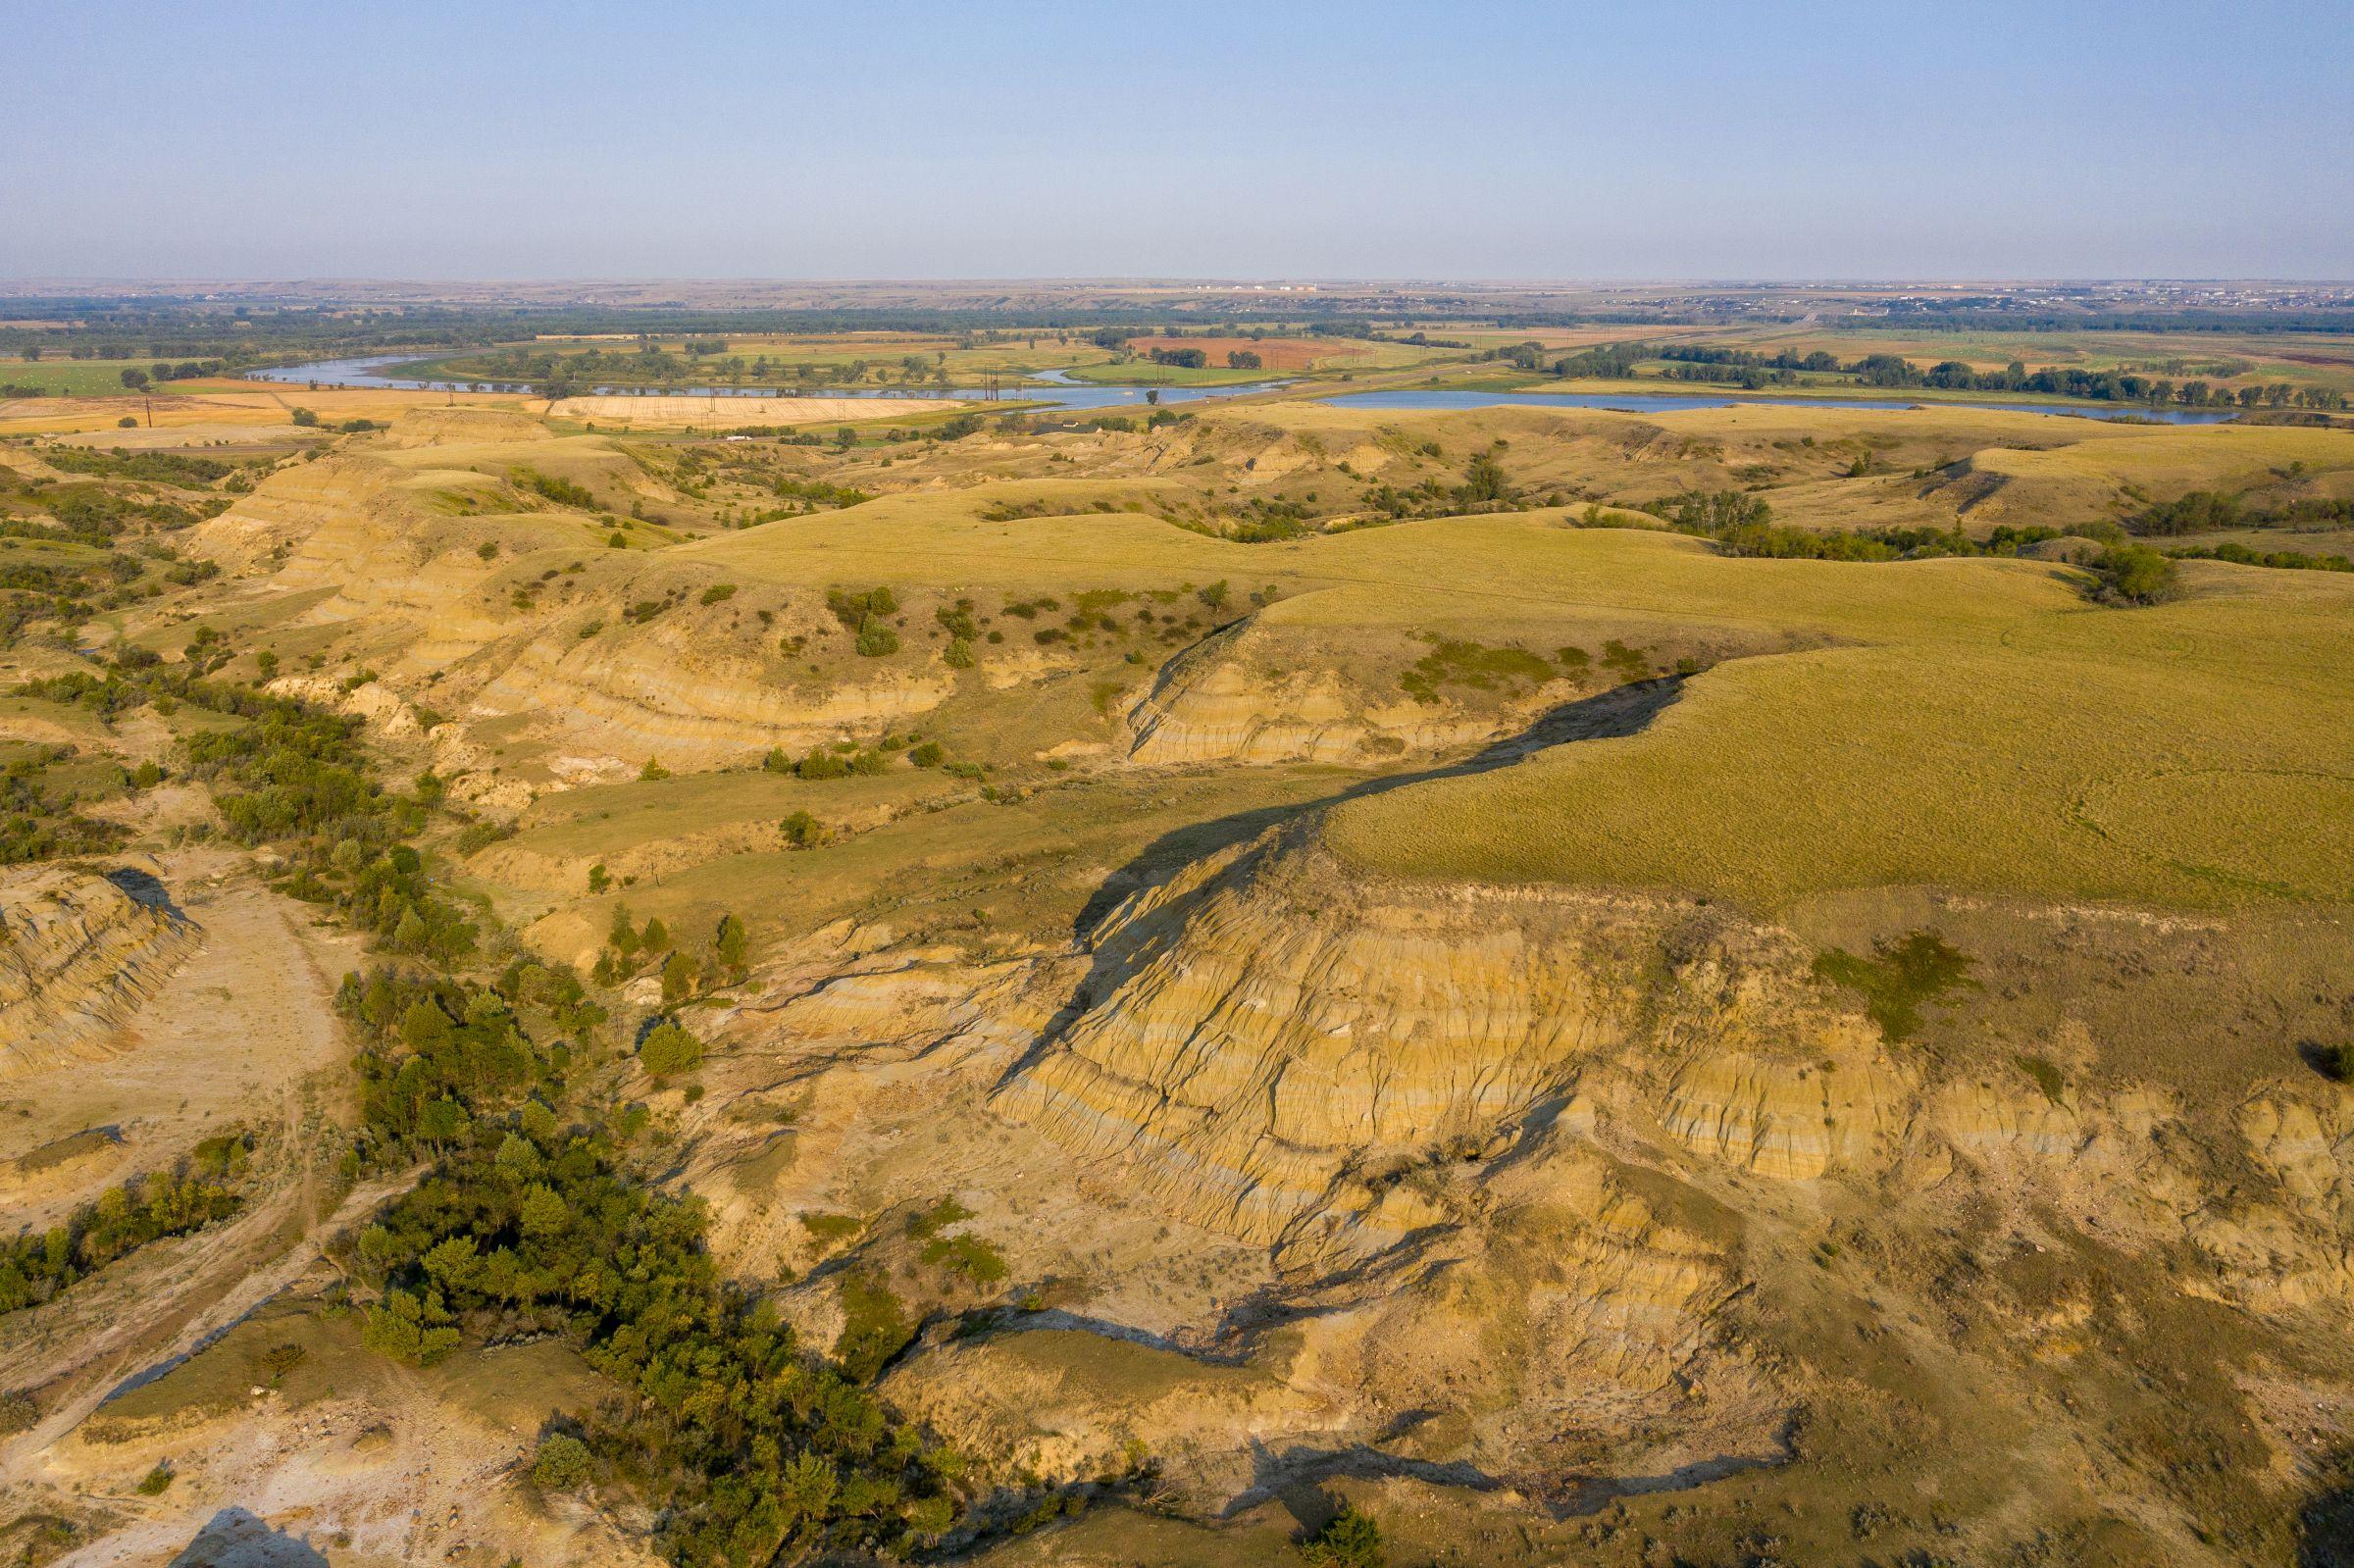 auctions-land-mckenzie-county-north-dakota-270-acres-listing-number-15735-1-2021-09-10-125103.jpeg